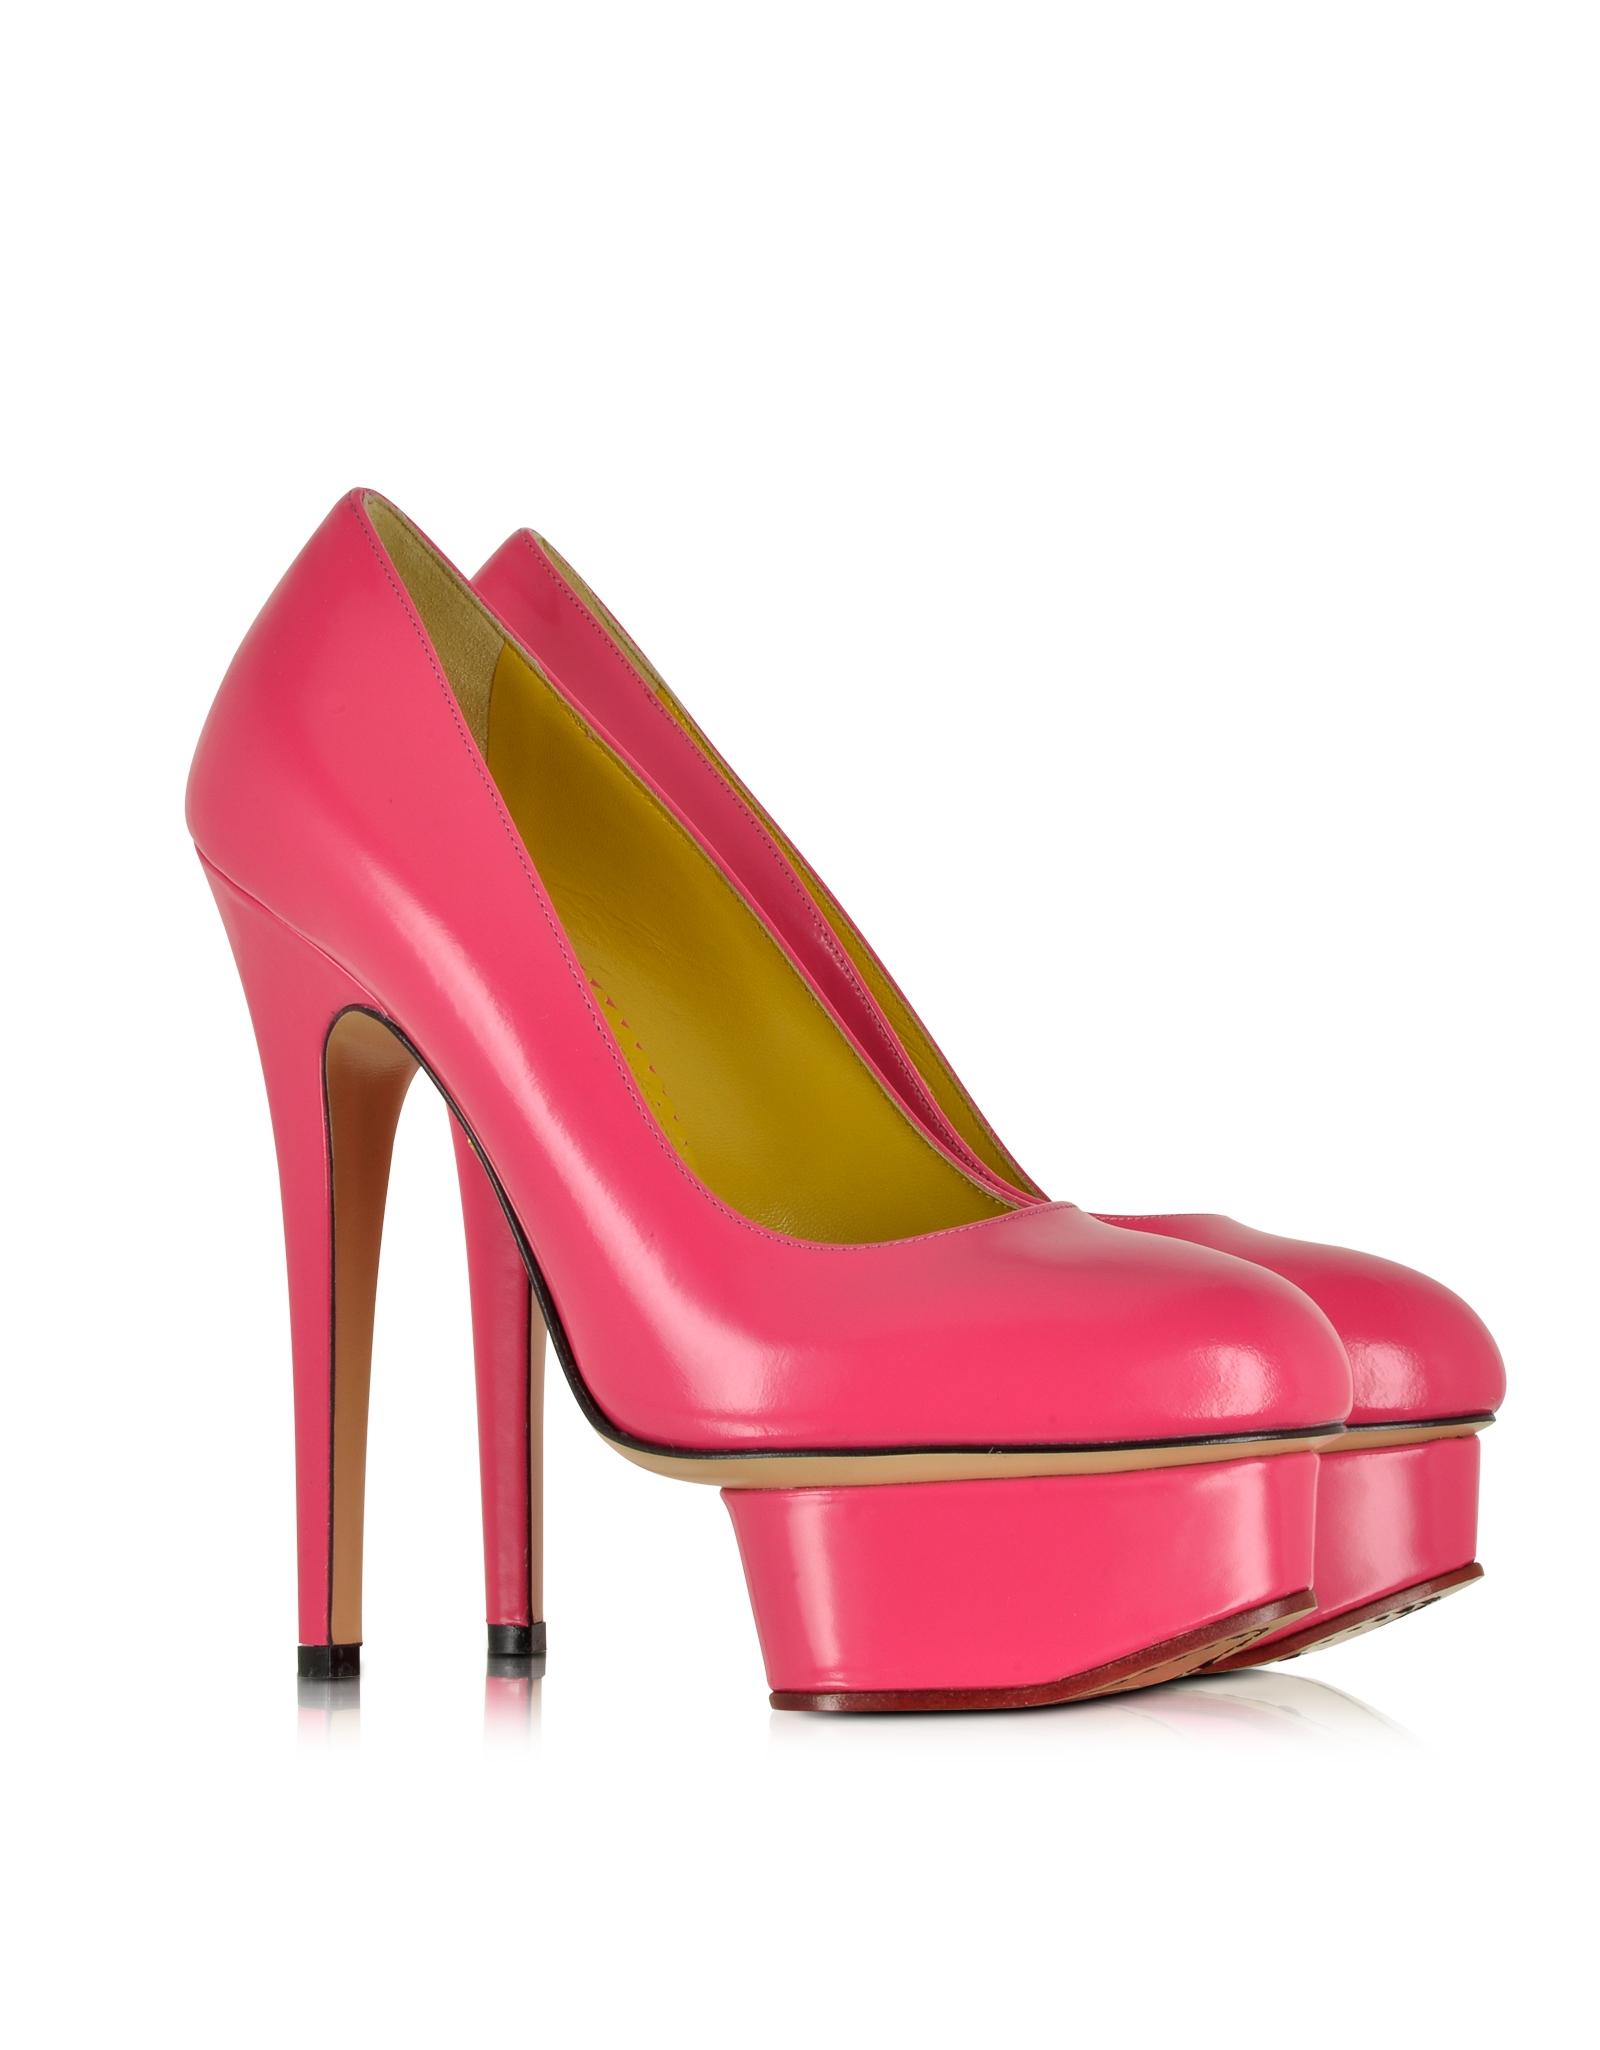 6f16b06f7a3 Lyst - Charlotte Olympia Dolly Shocking Pink Leather Platform Pump ...